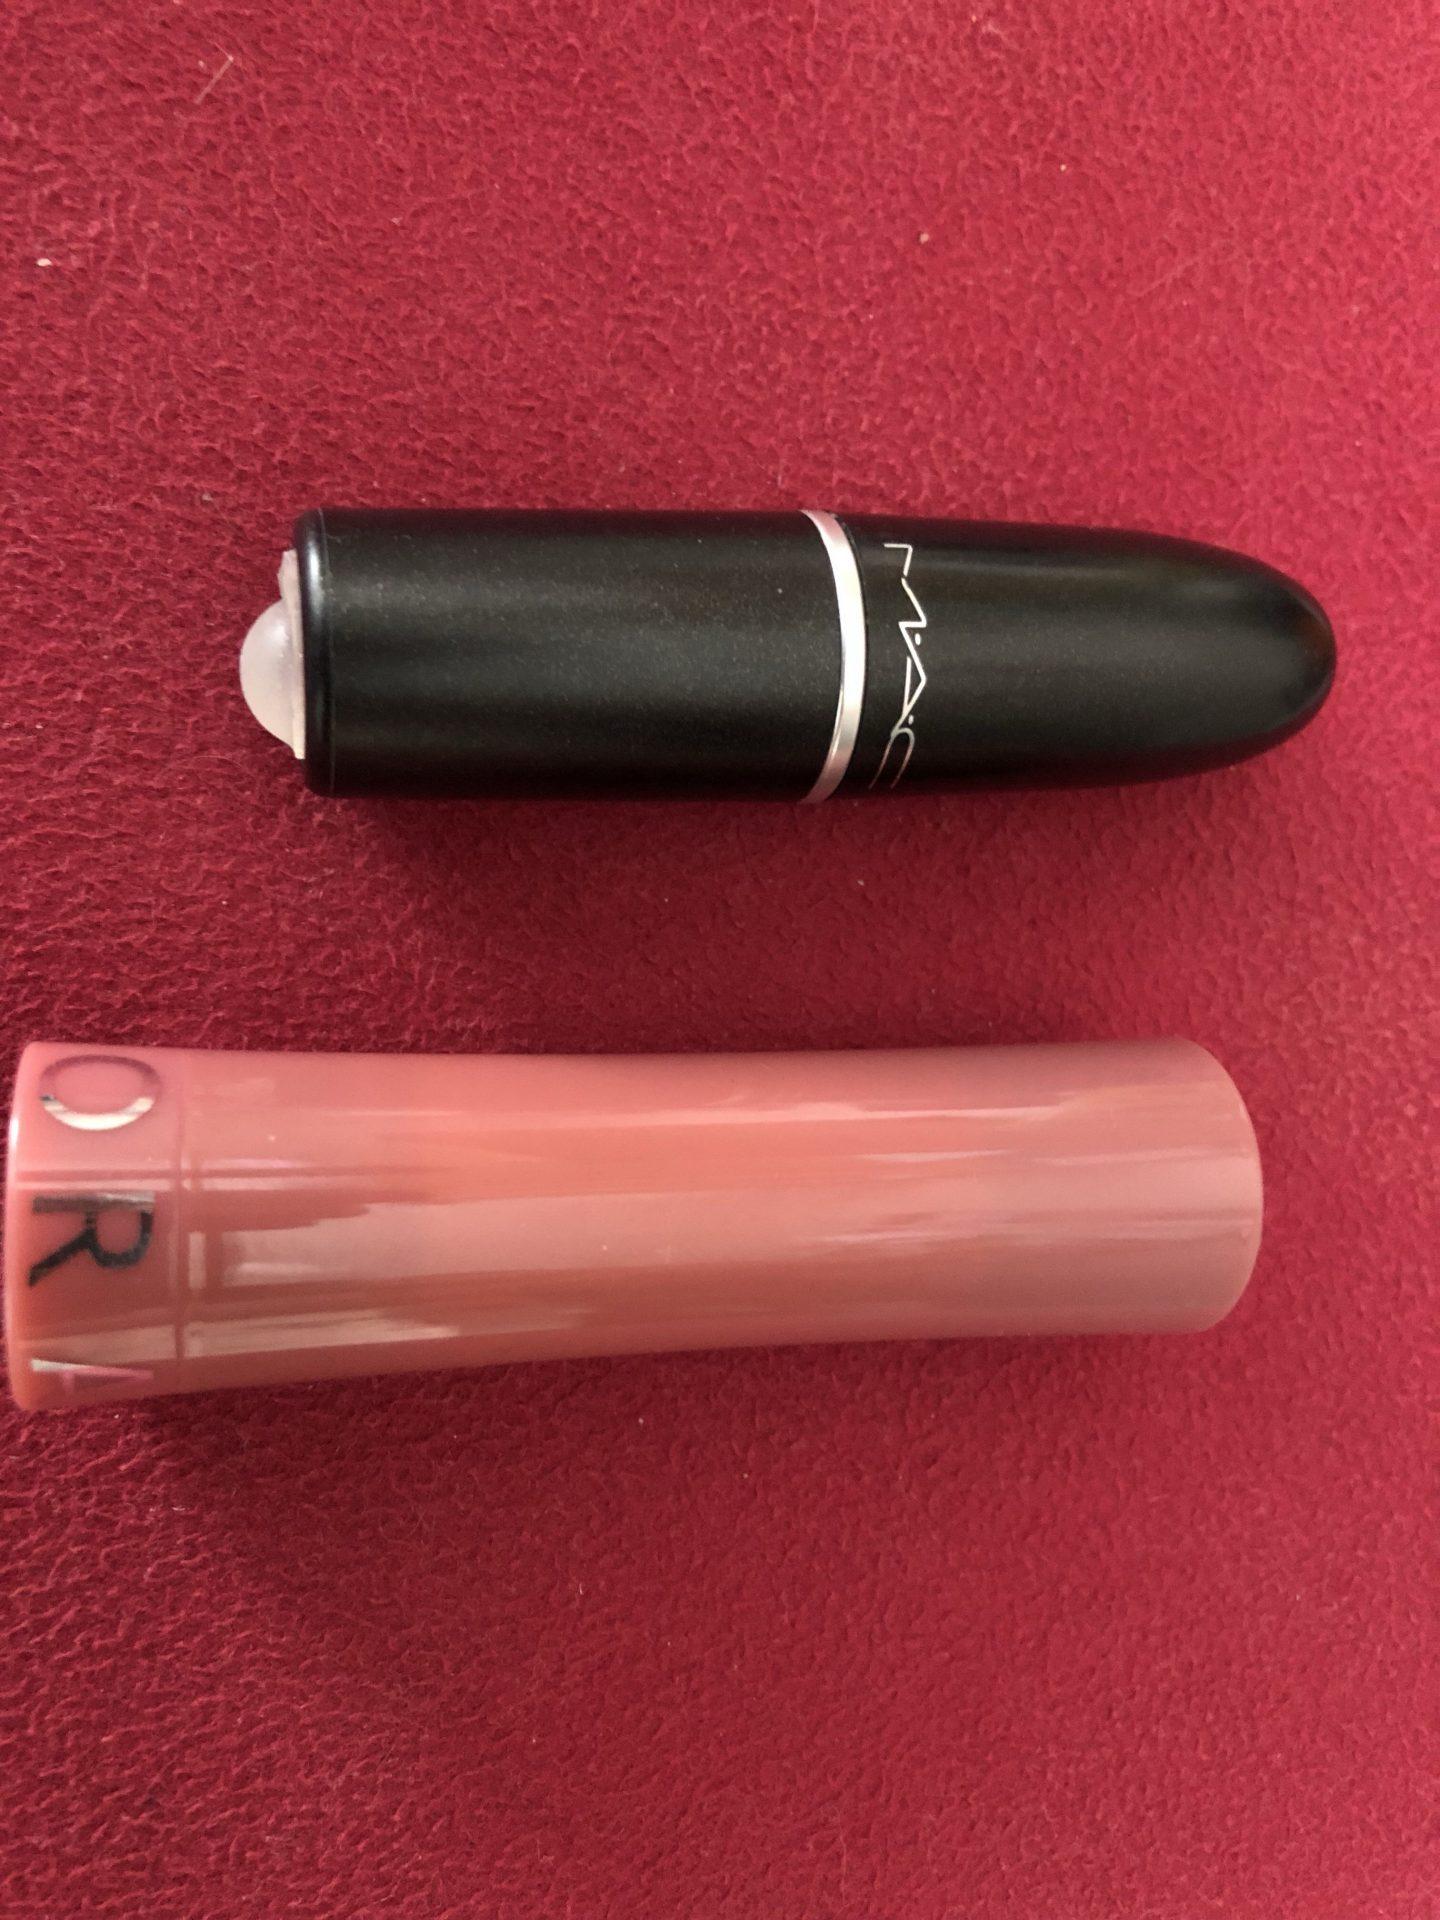 A photo of some lipsticks